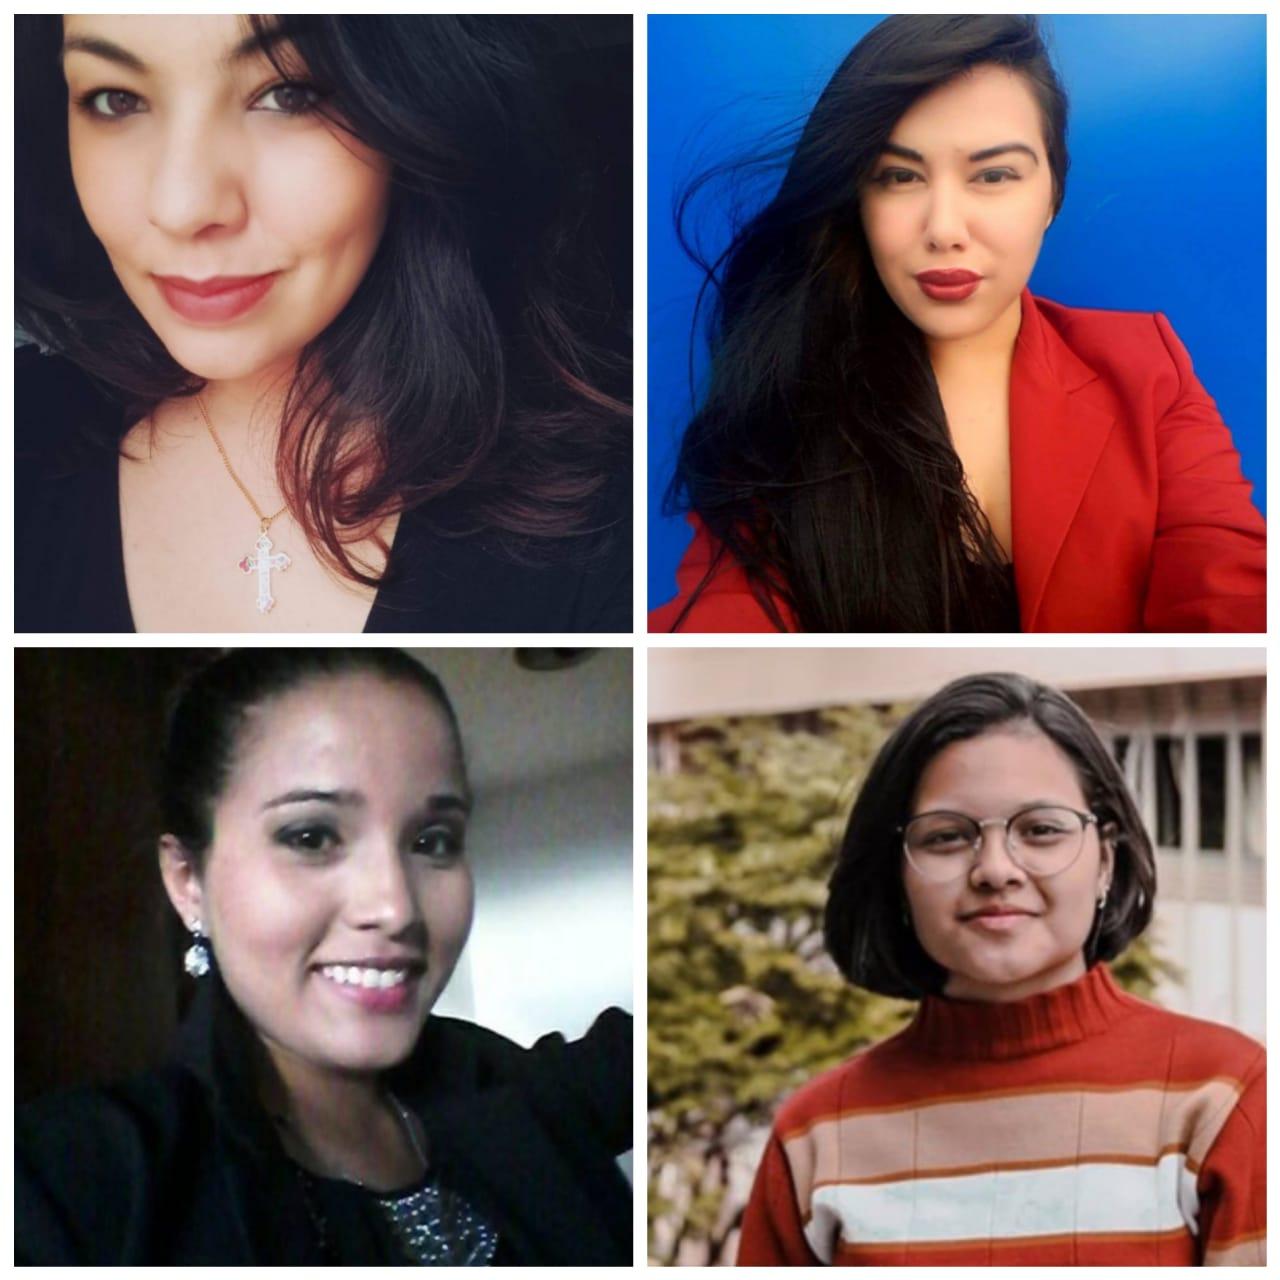 Alynne Sipaúba, Mariana Domin, Marina Farias e Raquel Rocha